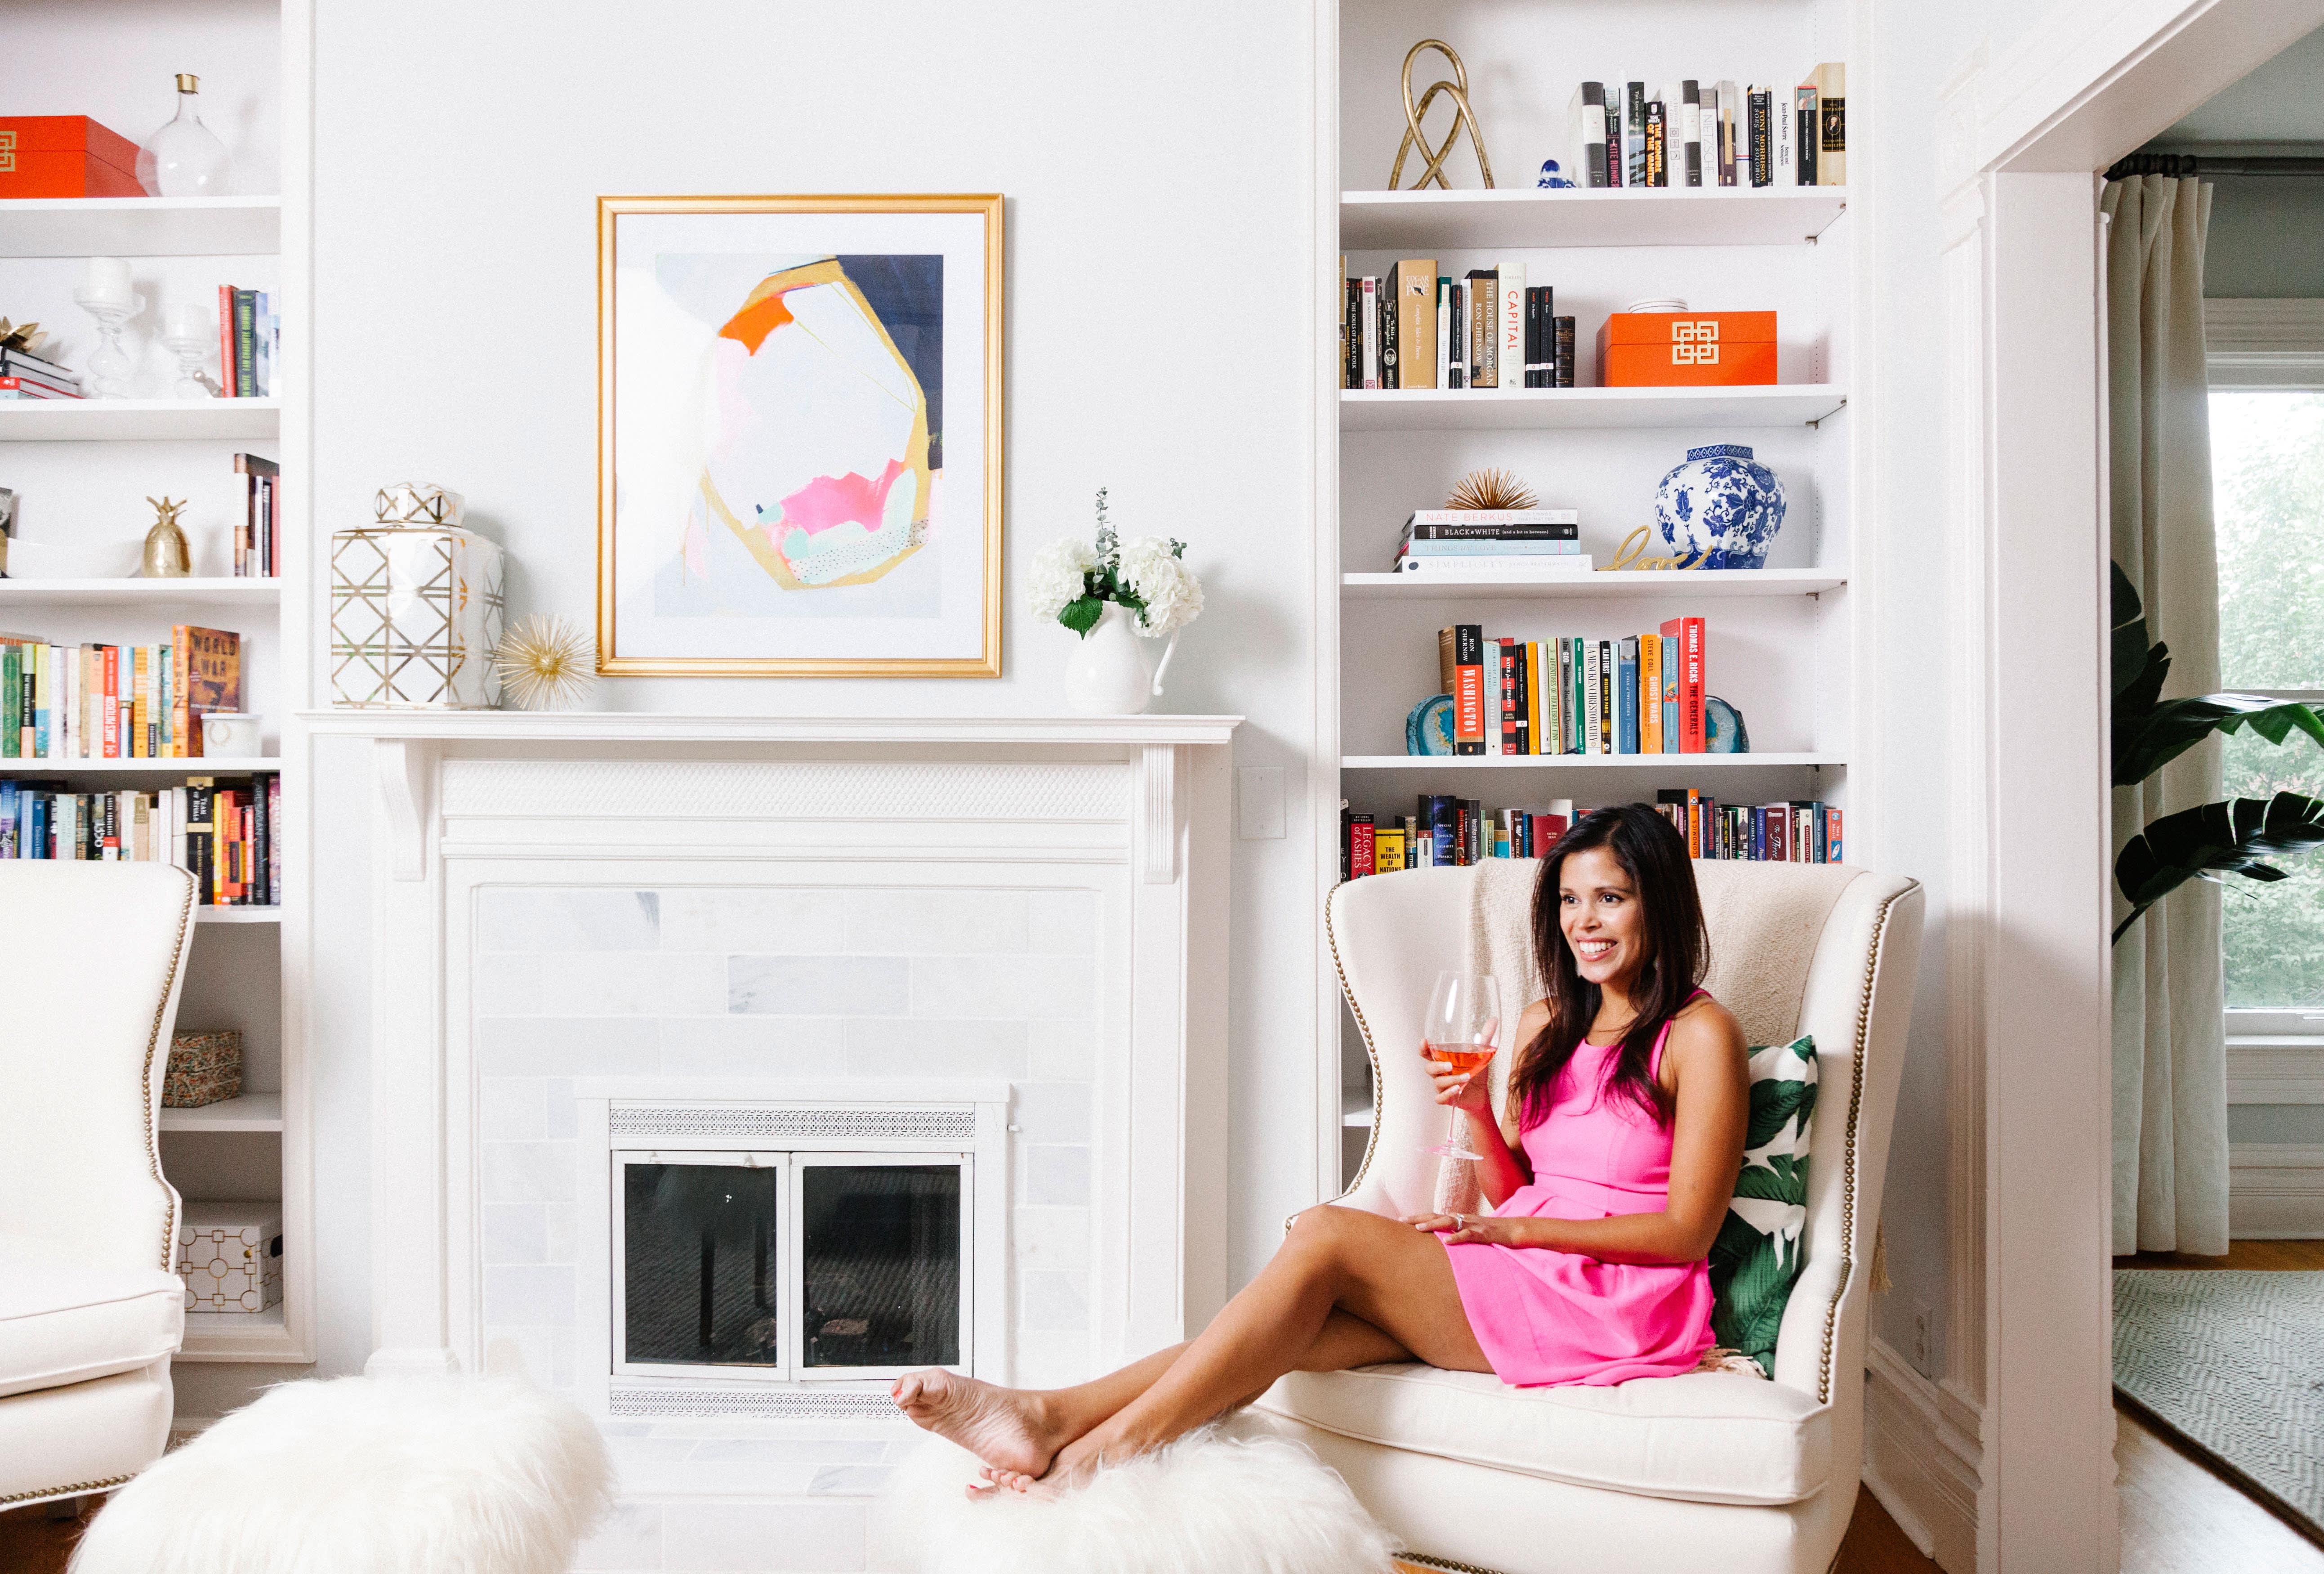 Meet the home design company that gives full service interior design Hgtv Home Design App Html on interior design app, hgtv property brothers kitchen designs, urban design app, silhouette design app,